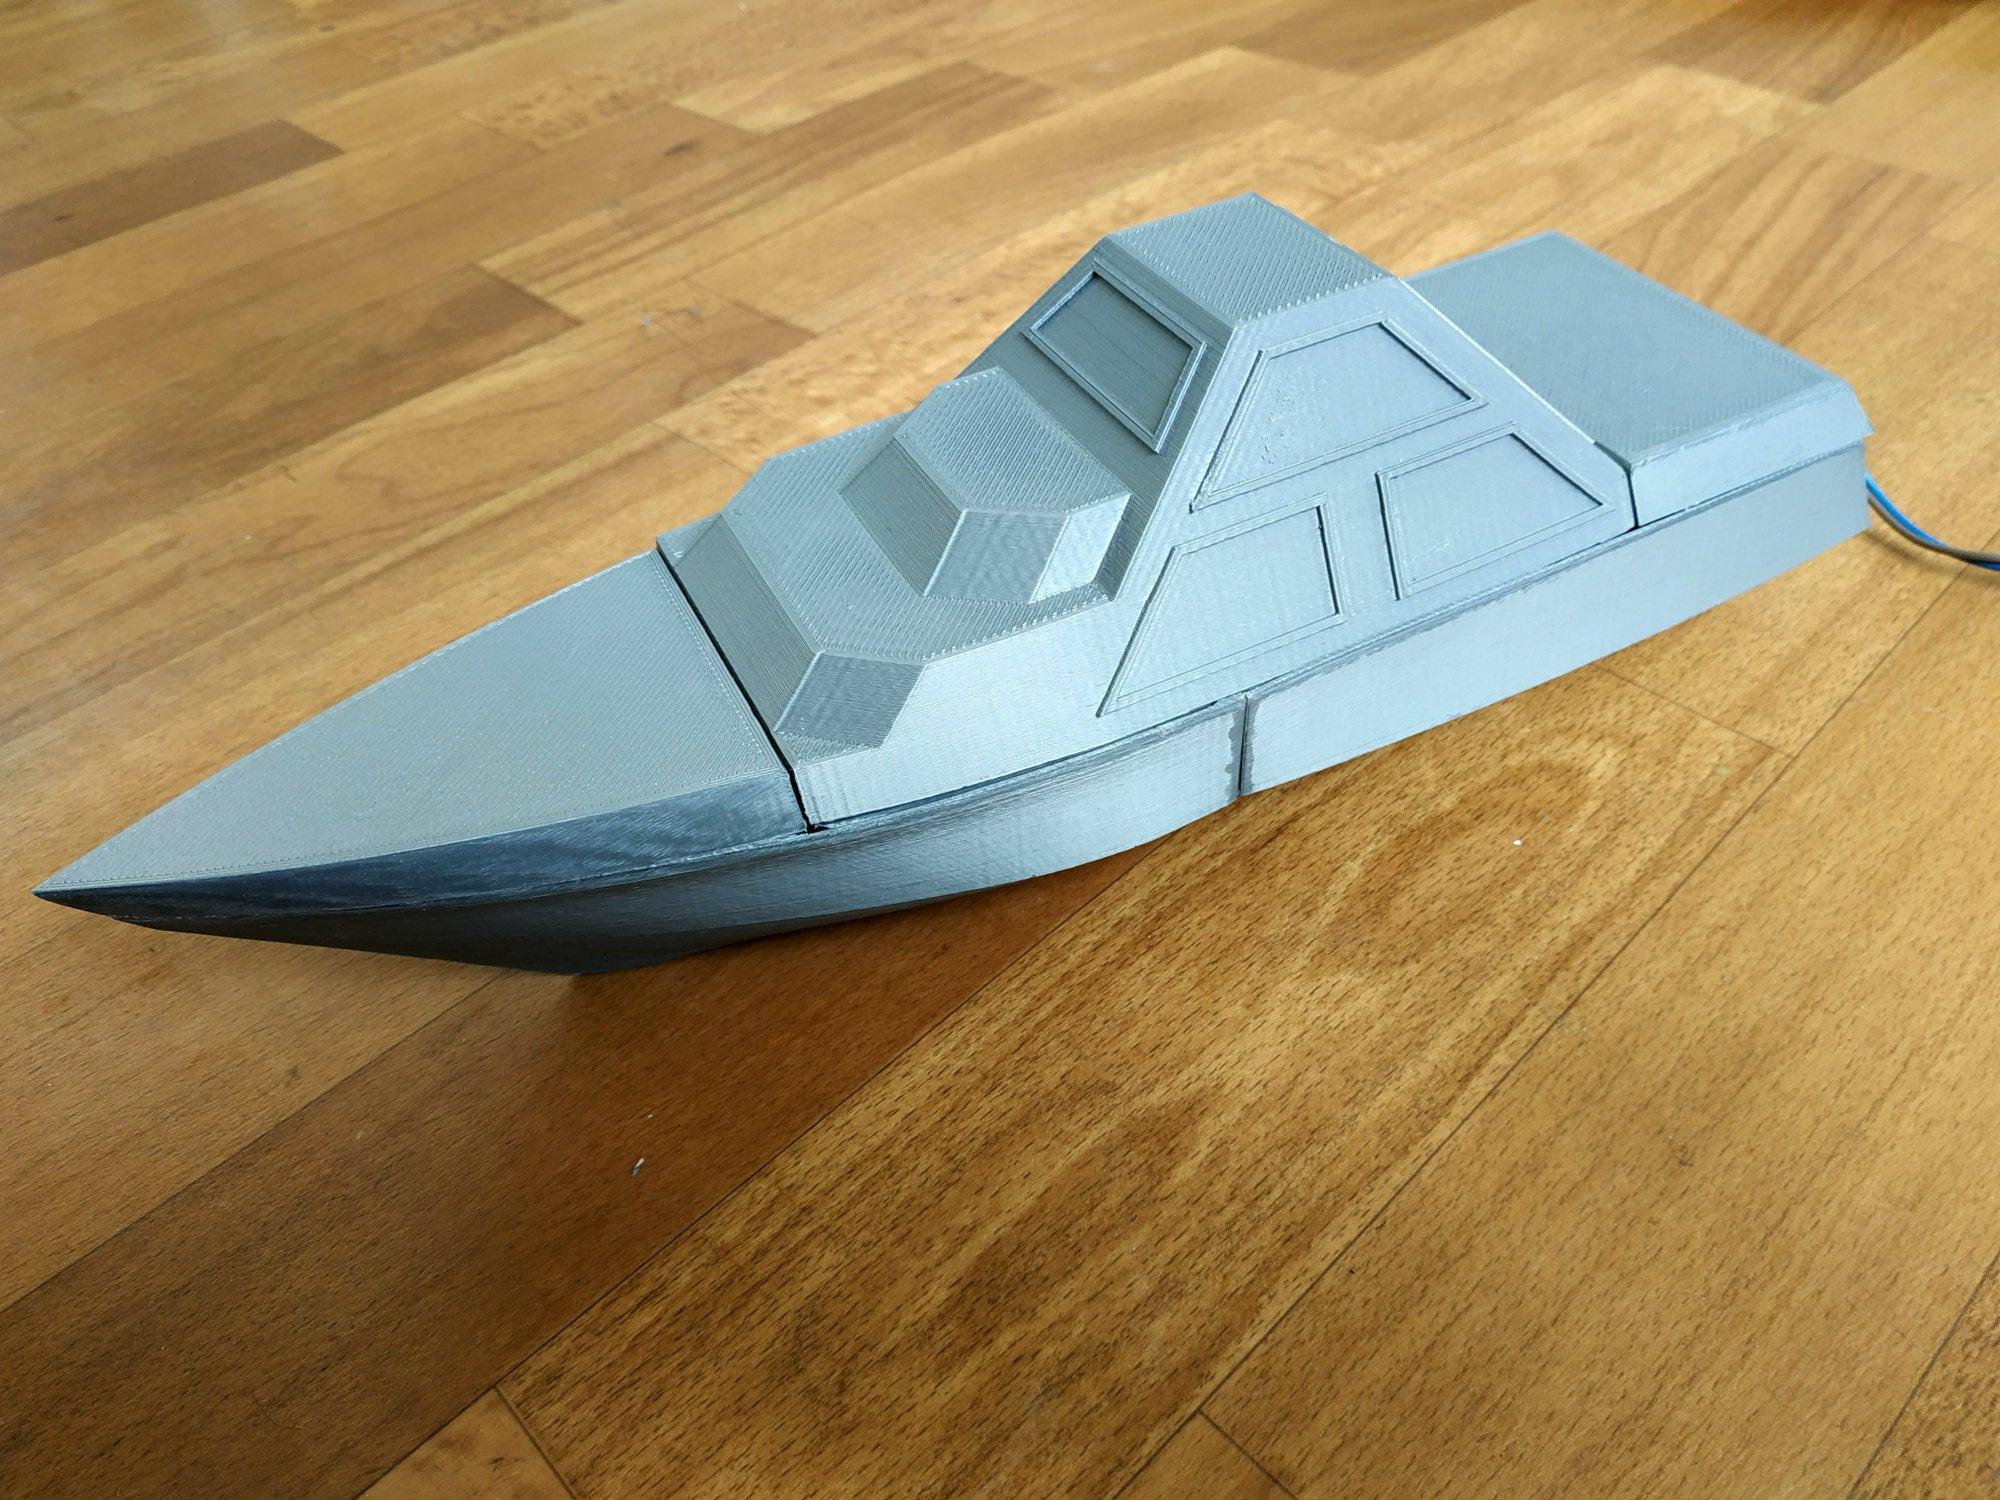 DARINS_1_1.jpg Download free STL file DARINS - stealth boat with reactionless propulsion drive • 3D printer design, TanyaAkinora